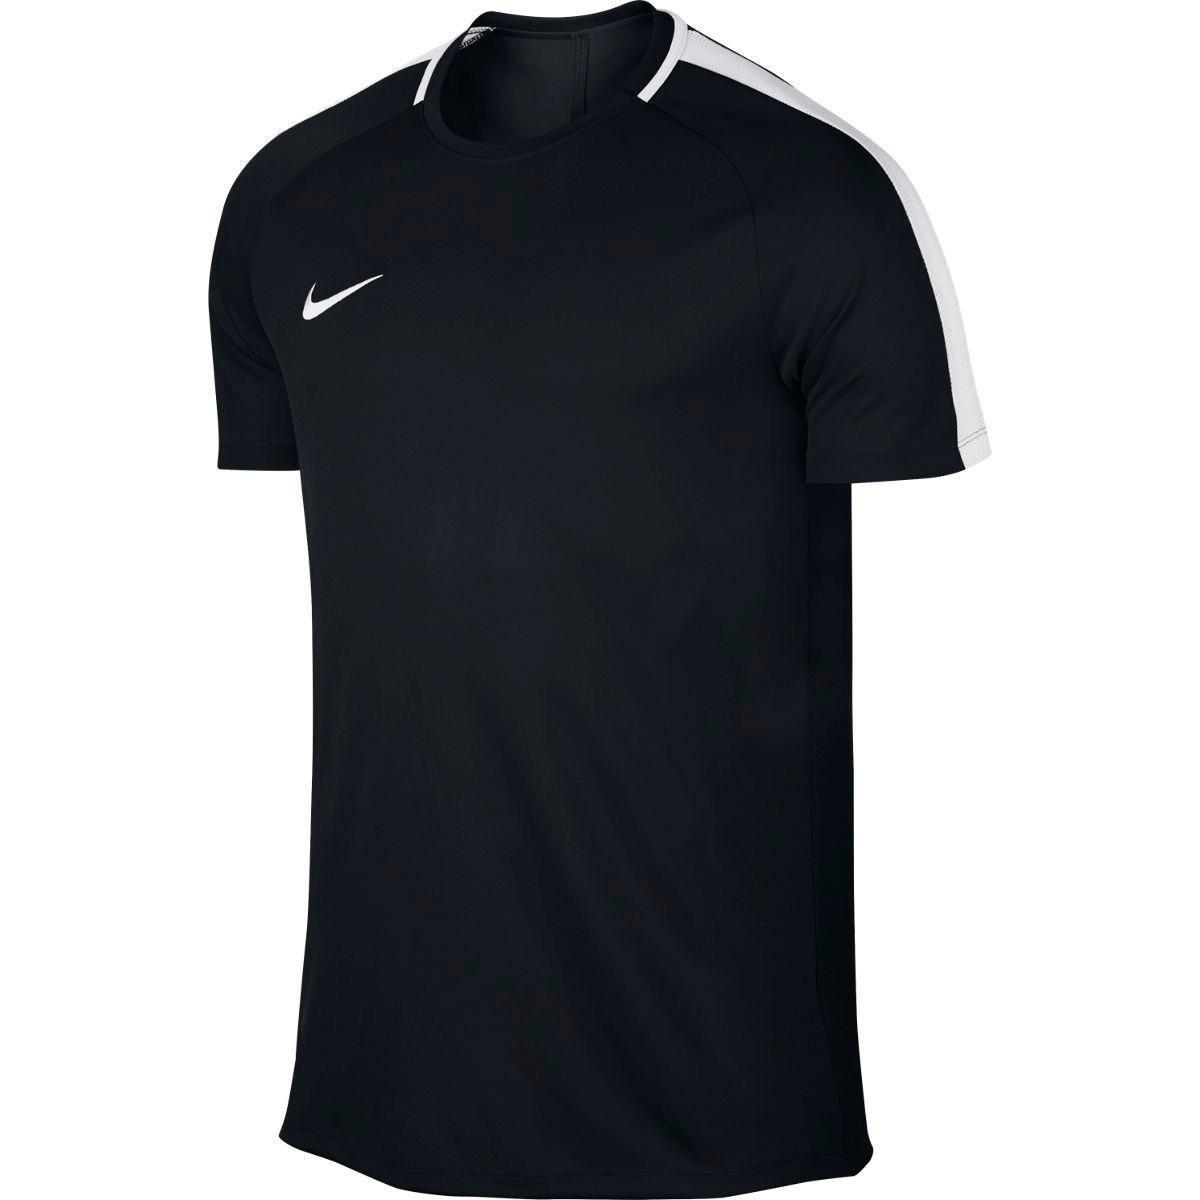 Camisa Nike Academy Masculina - Preto e Branco - Compre Agora  b6f3ab4b8f184